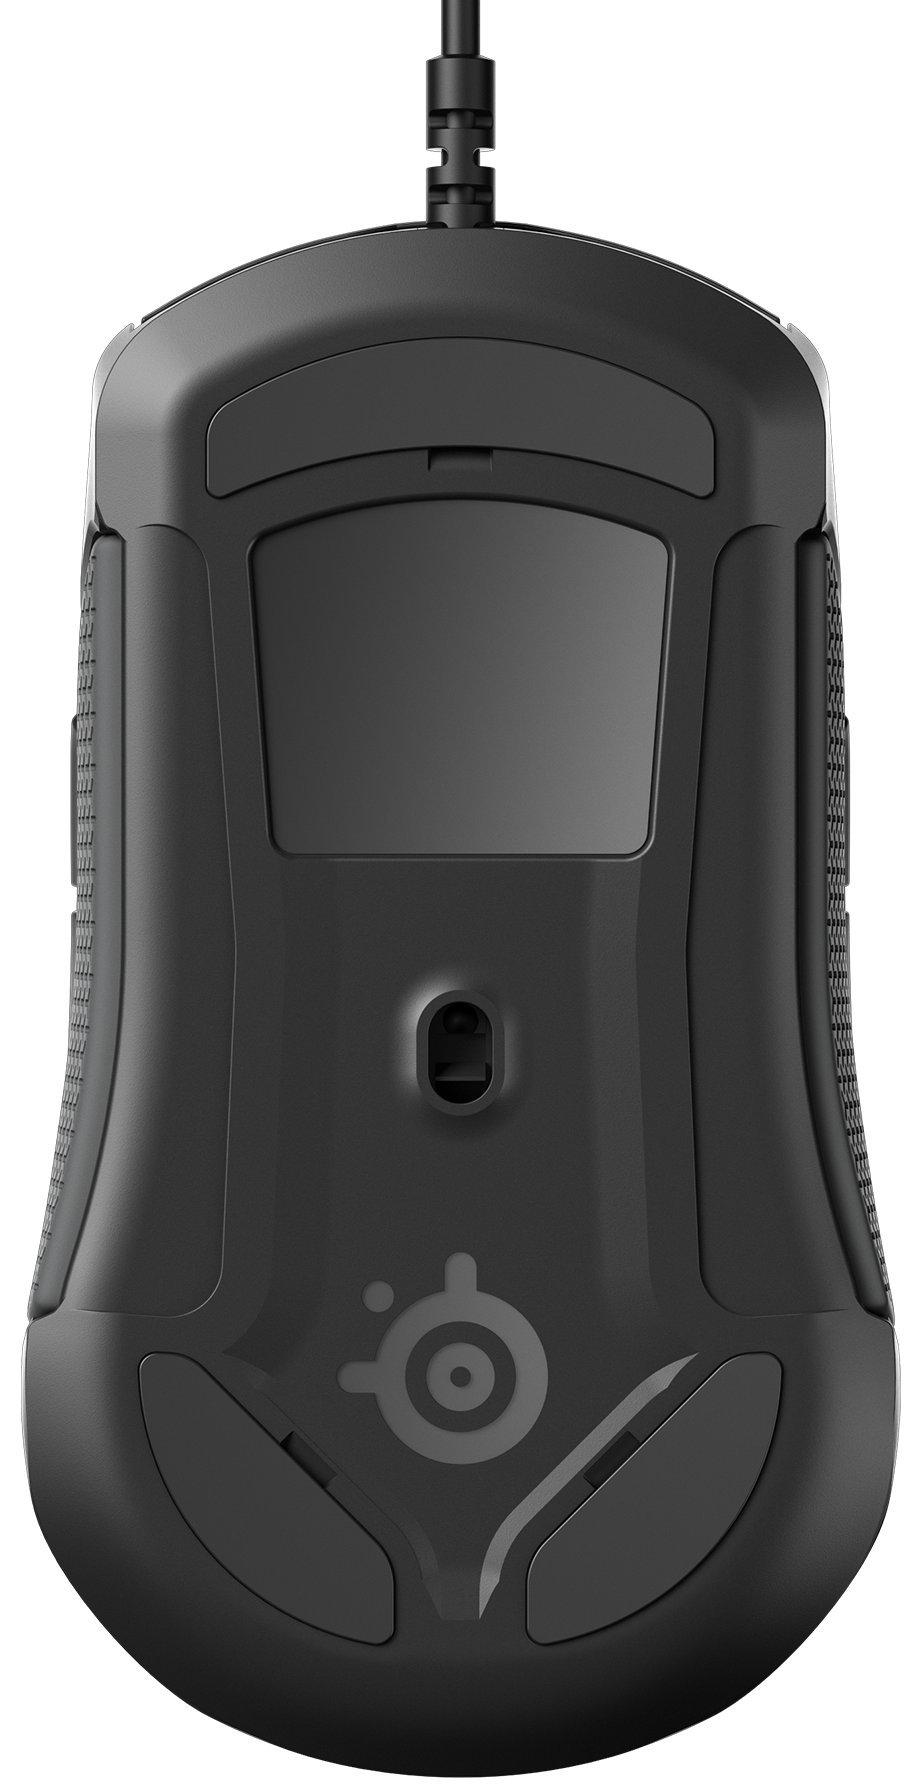 SteelSeries Sensei 310 Gaming Mouse - 12,000 CPI TrueMove3 Optical Sensor - Ambidextrous Design - Split-Trigger Buttons - RGB Lighting by SteelSeries (Image #9)